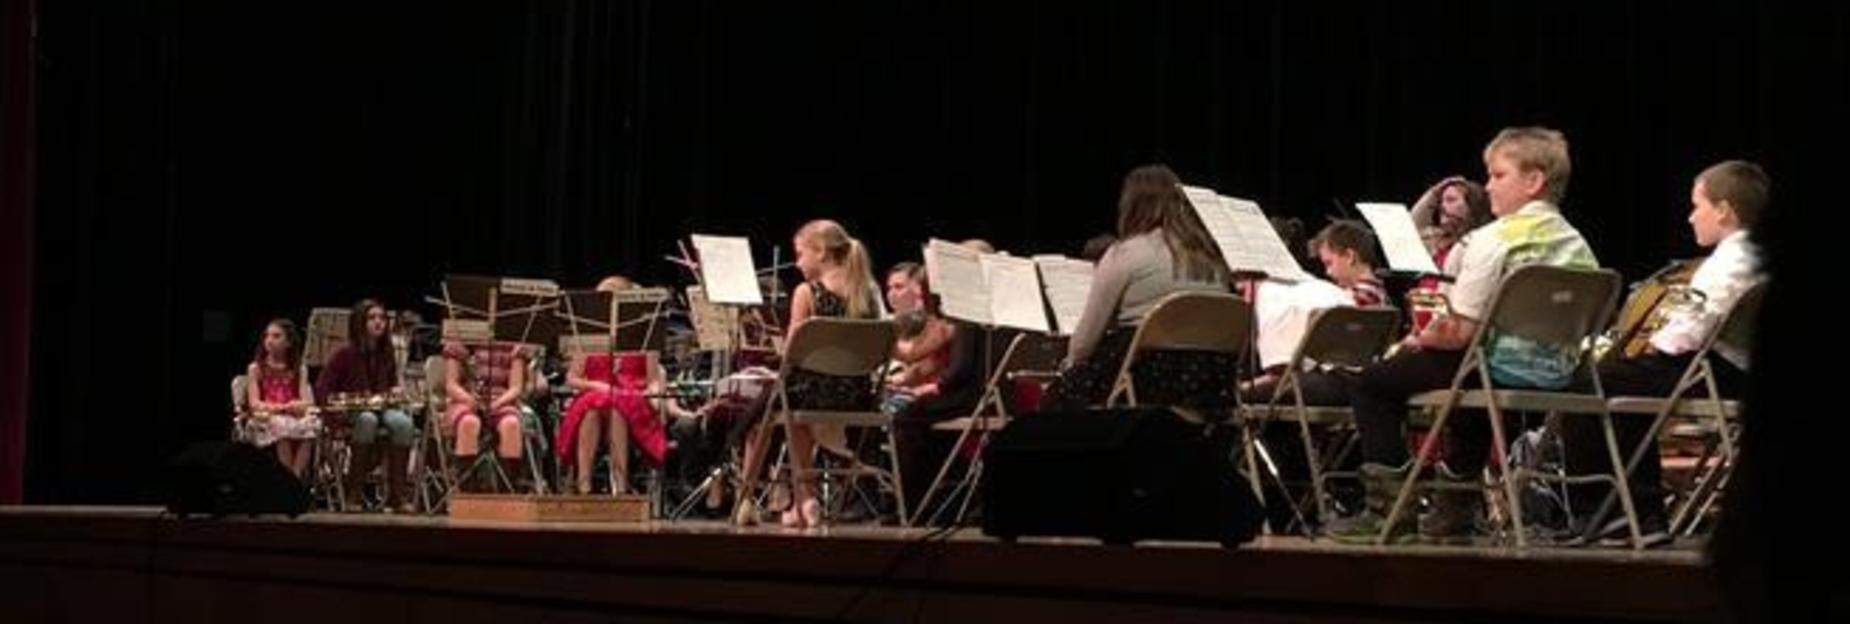 Elementary Band